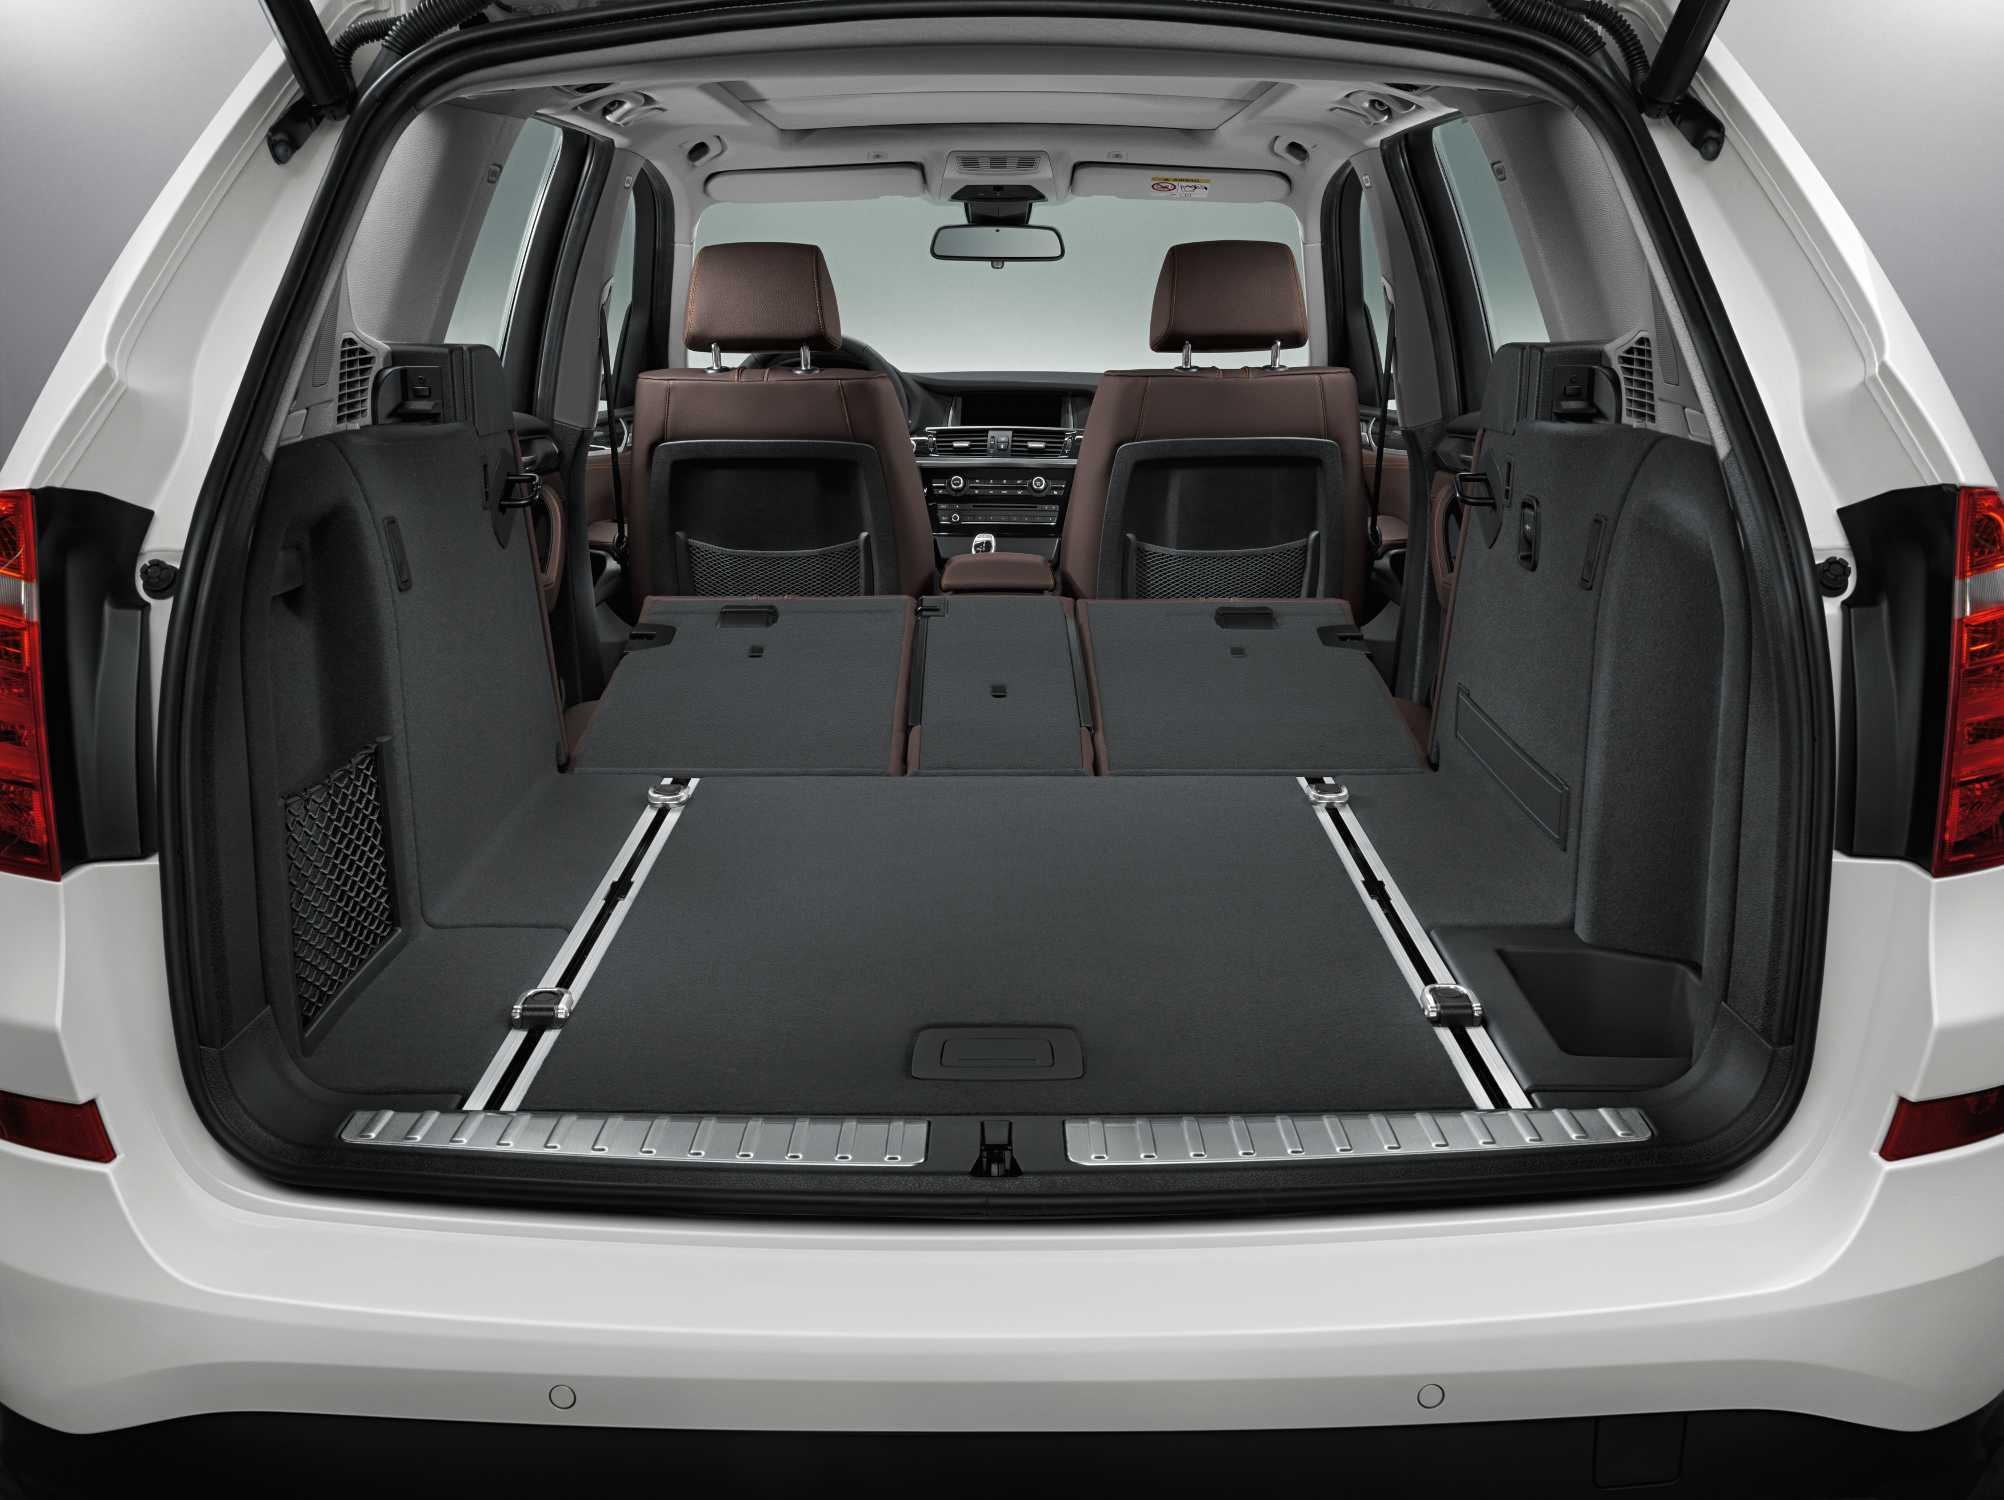 the new bmw x3 mineral white metallic interior nevada leather mocha interior trim. Black Bedroom Furniture Sets. Home Design Ideas